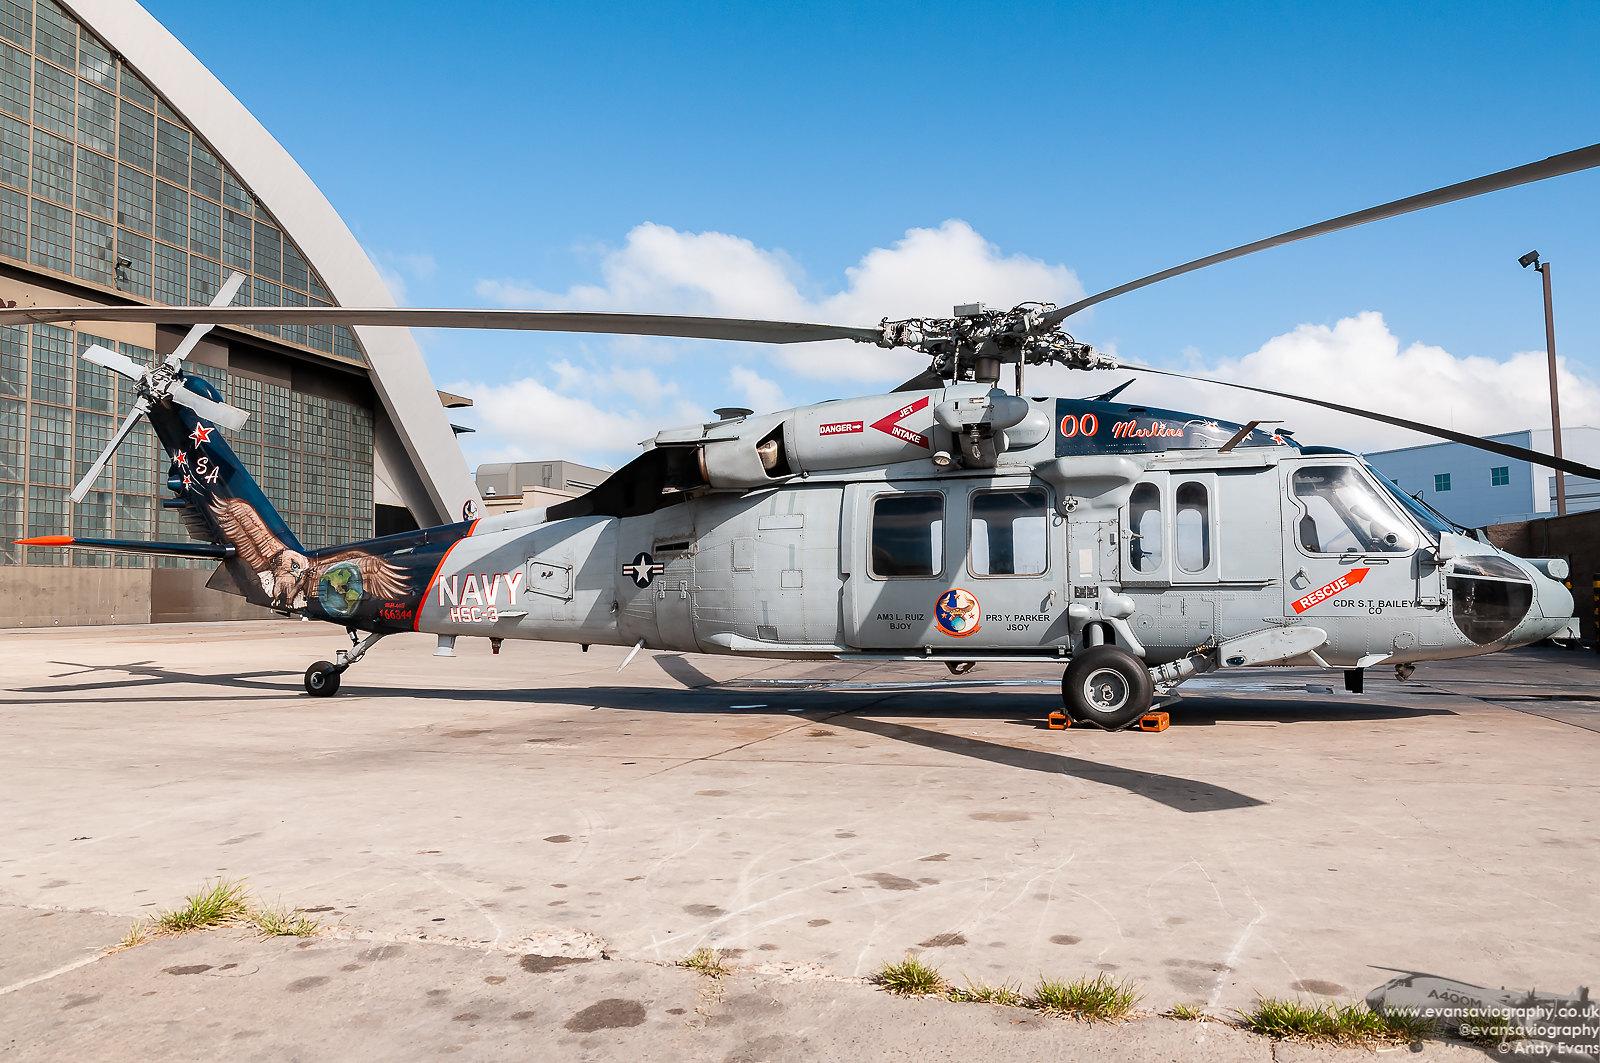 166344 MH-60S HSC-3